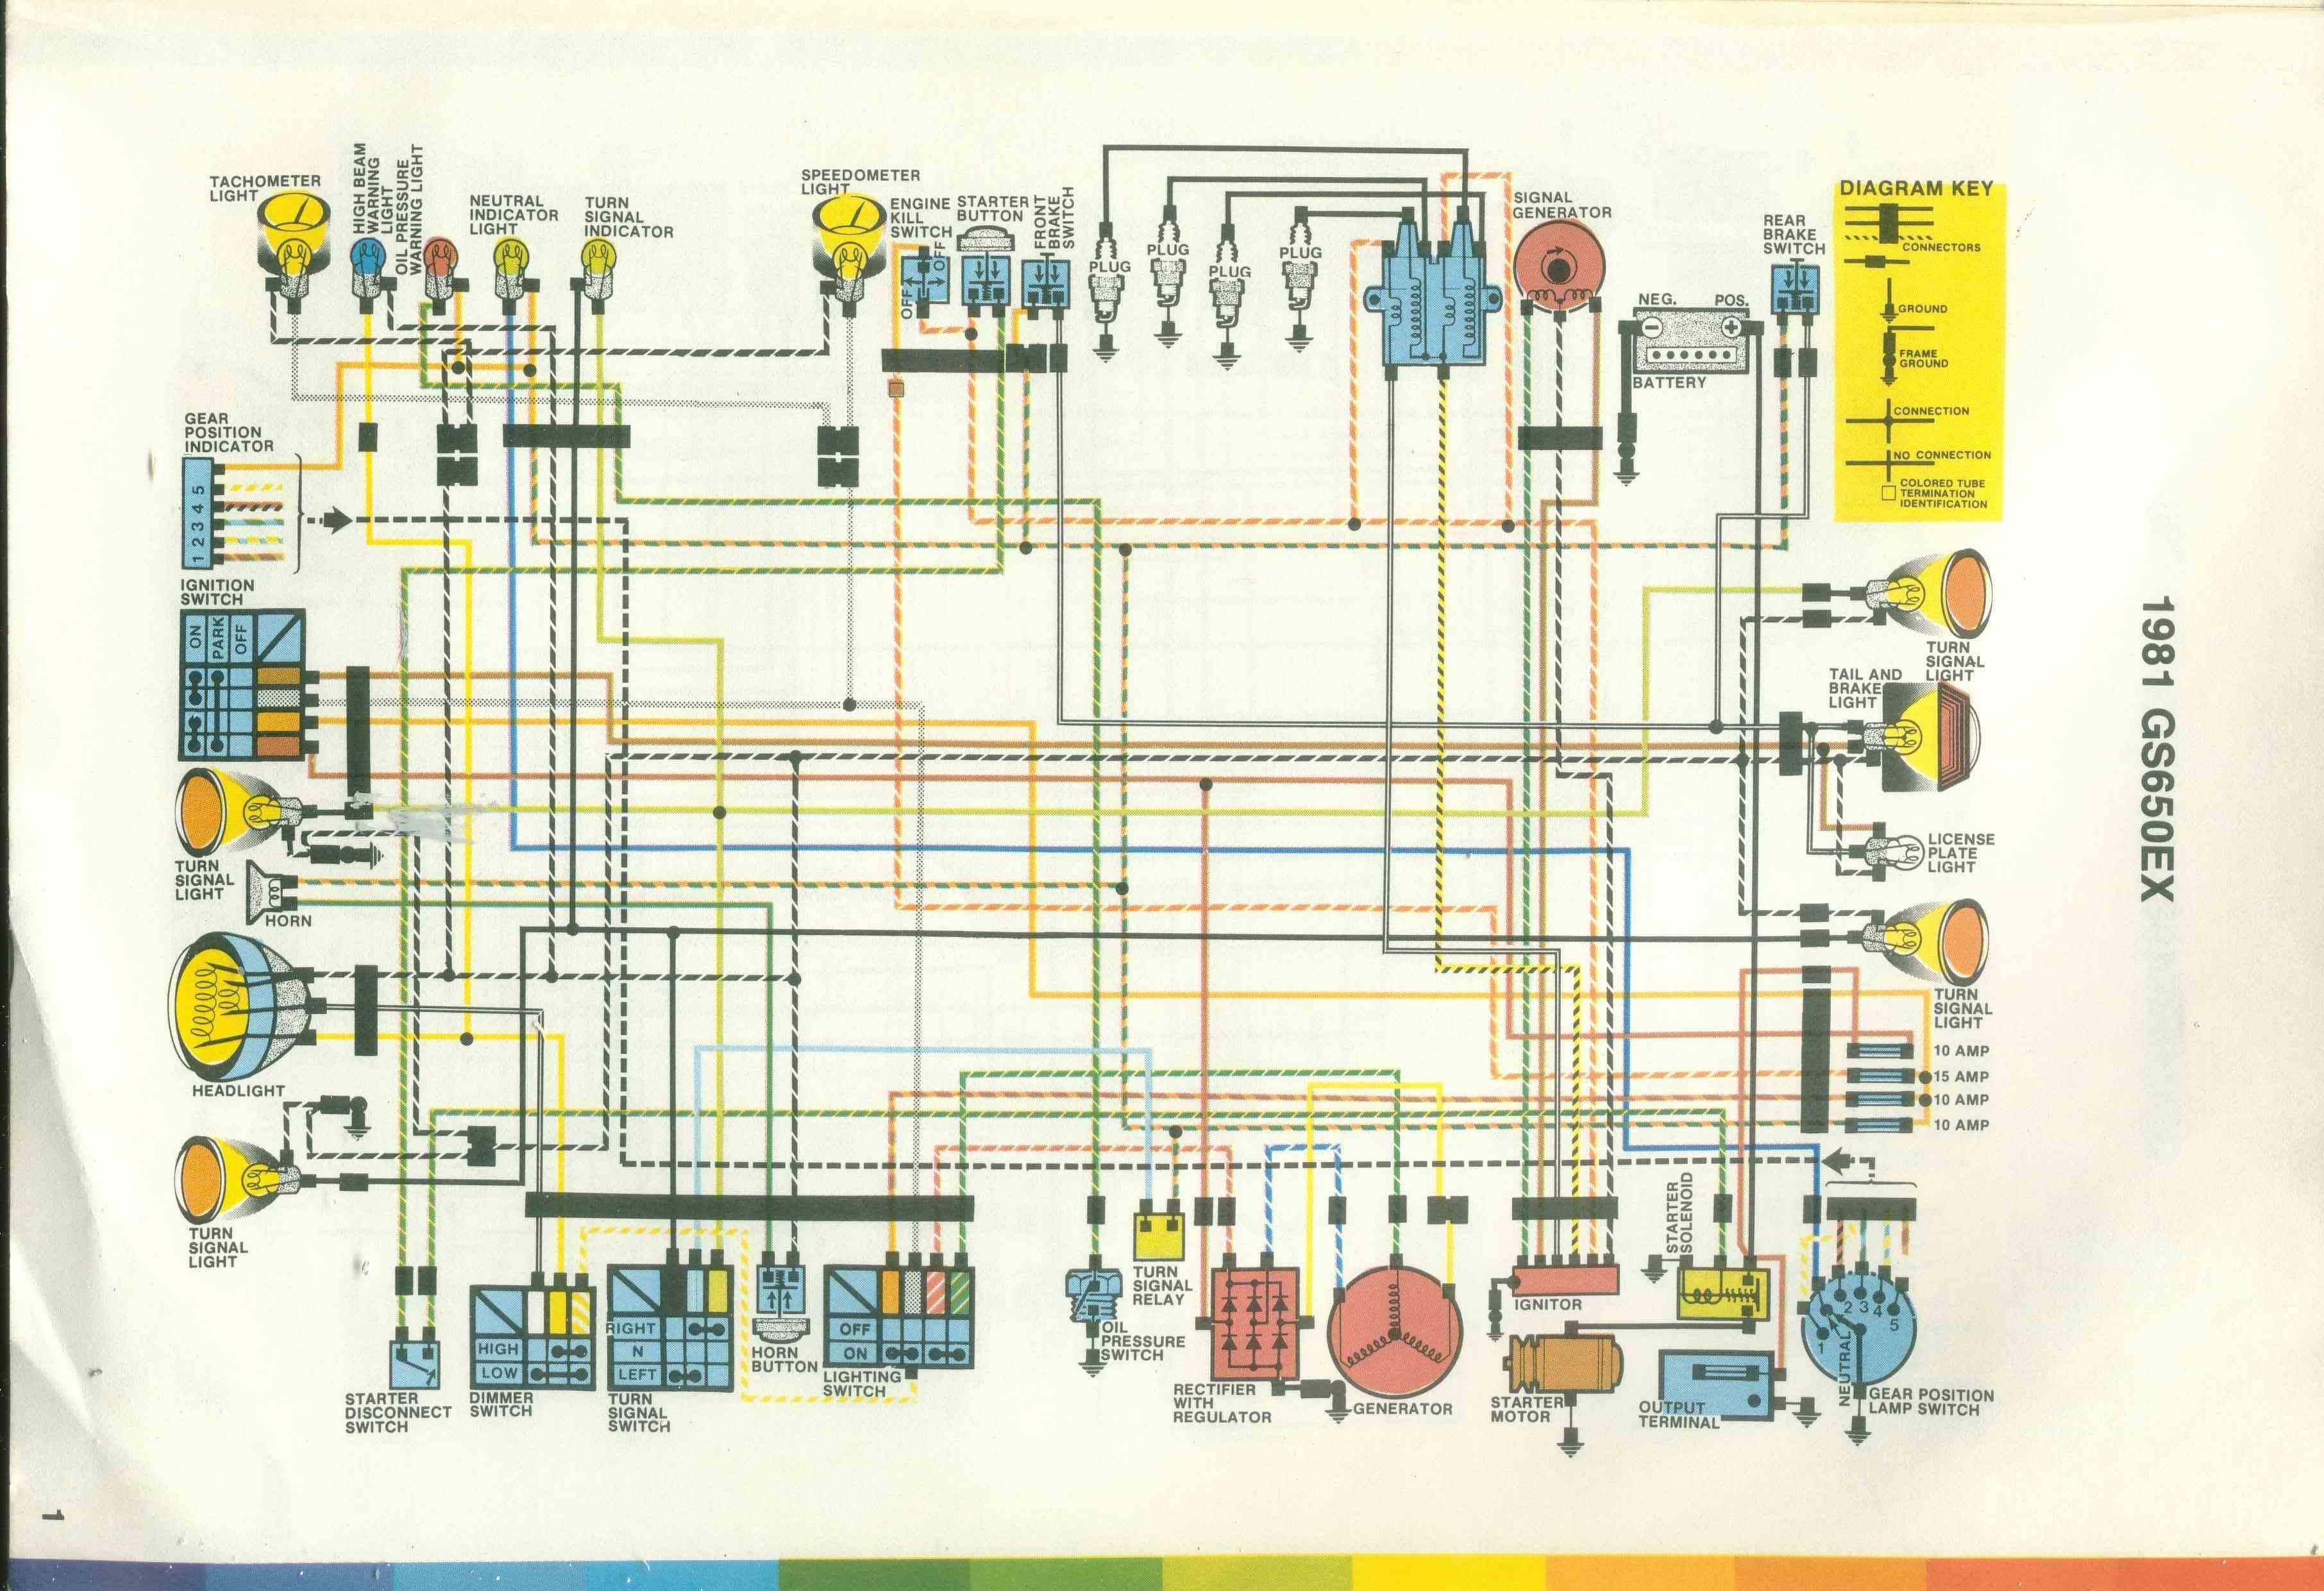 federal signal pa300 wiring diagram rf900 wiring diagram wiring diagrams show  rf900 wiring diagram wiring diagrams show